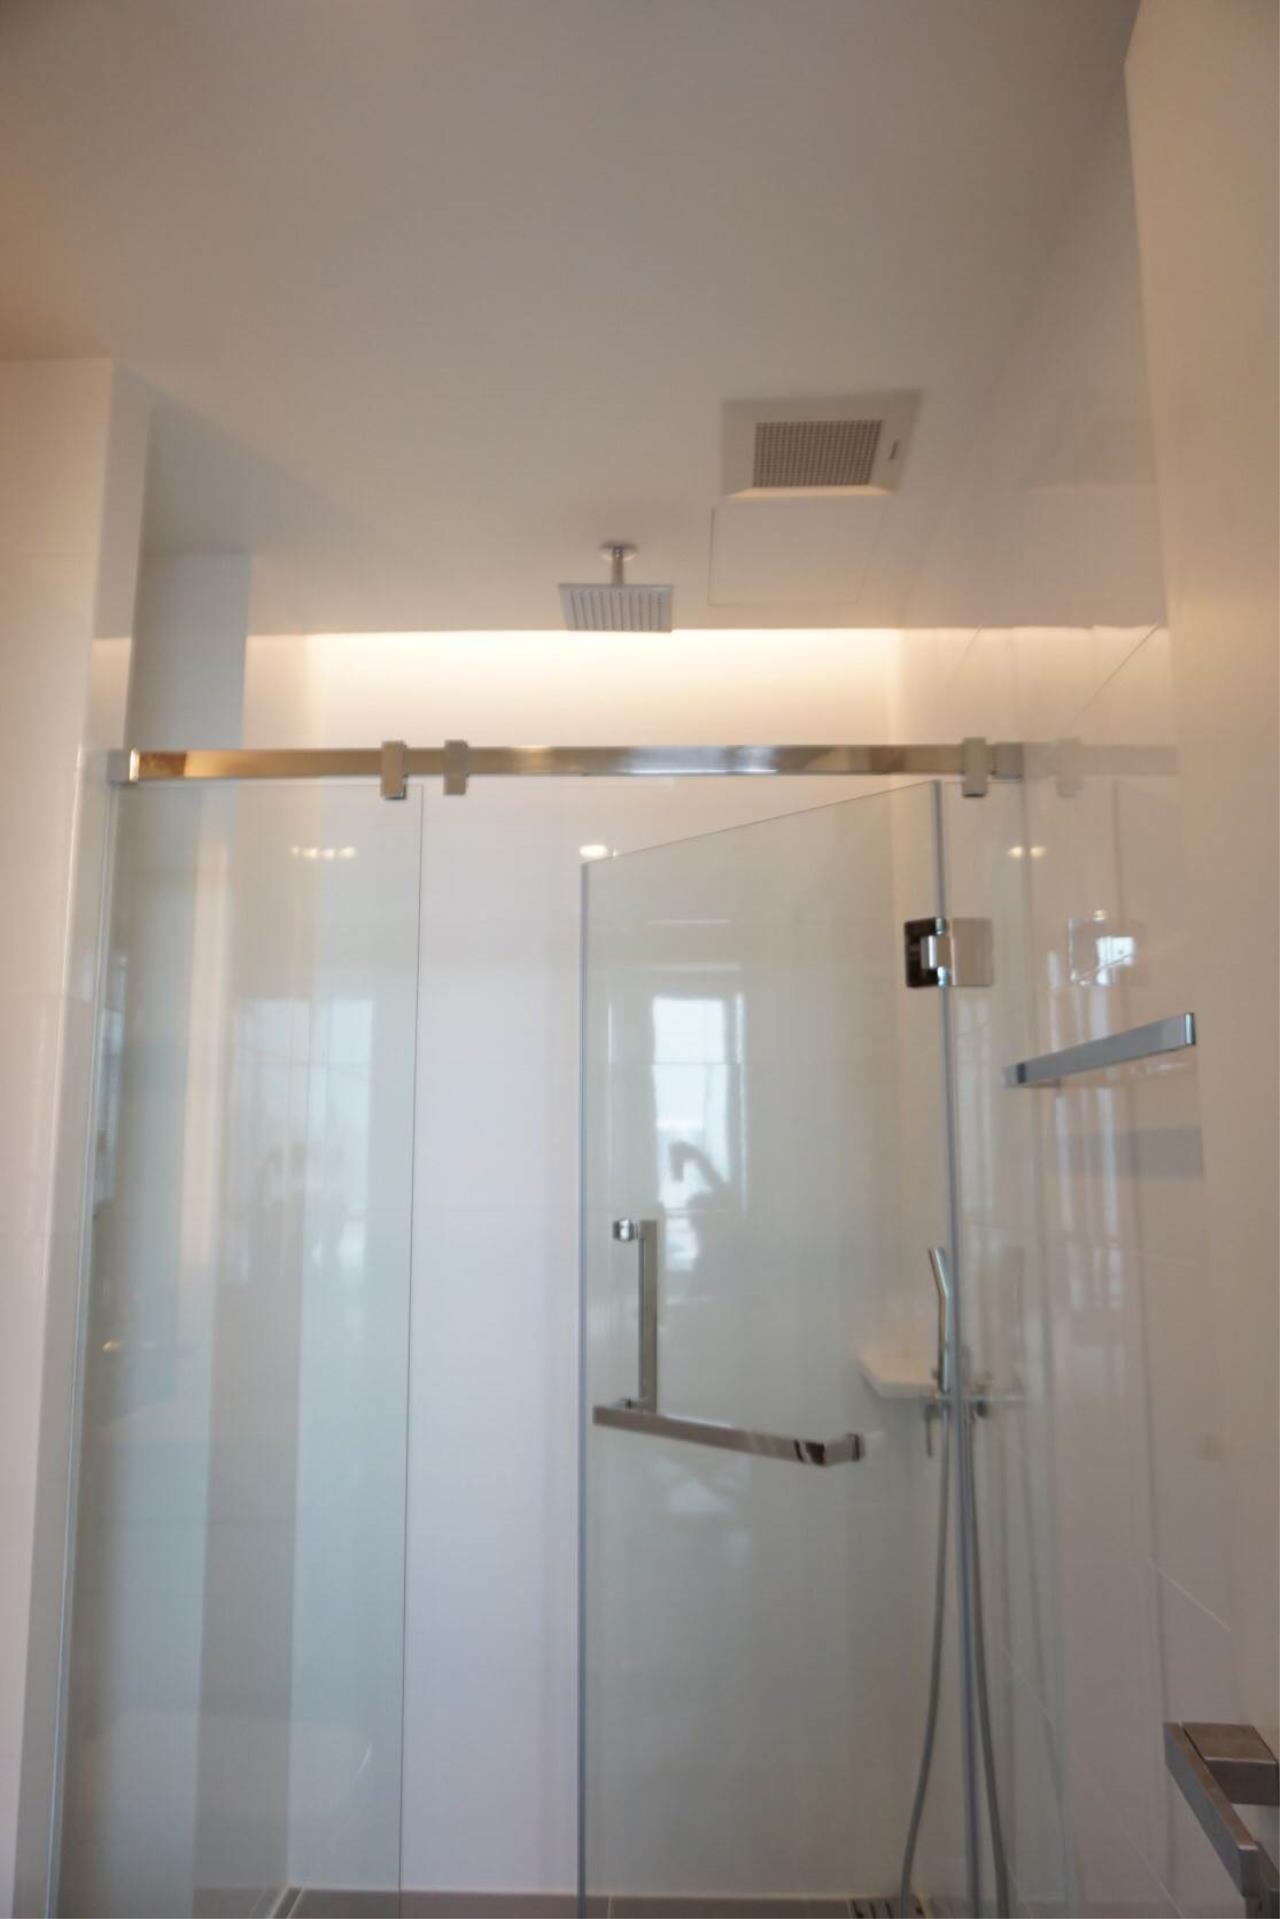 Mahanakornproperty Agency's Next to BTS Asoke 1 bedroom for rent, Unblocked View, Great infinity pool 5